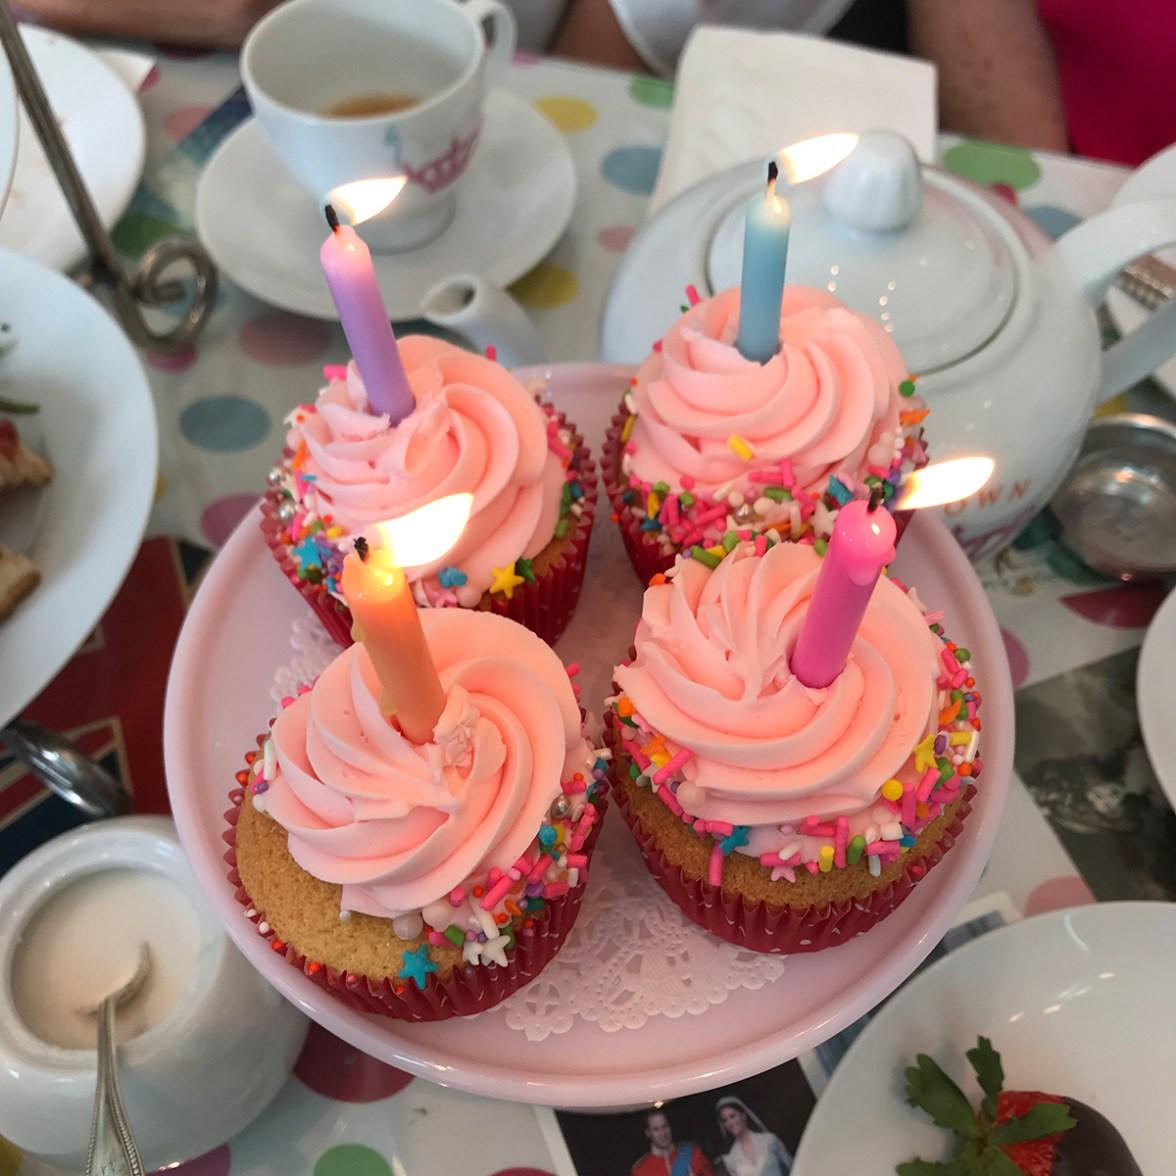 Birthday Cupcakes At Crown & Crumpet